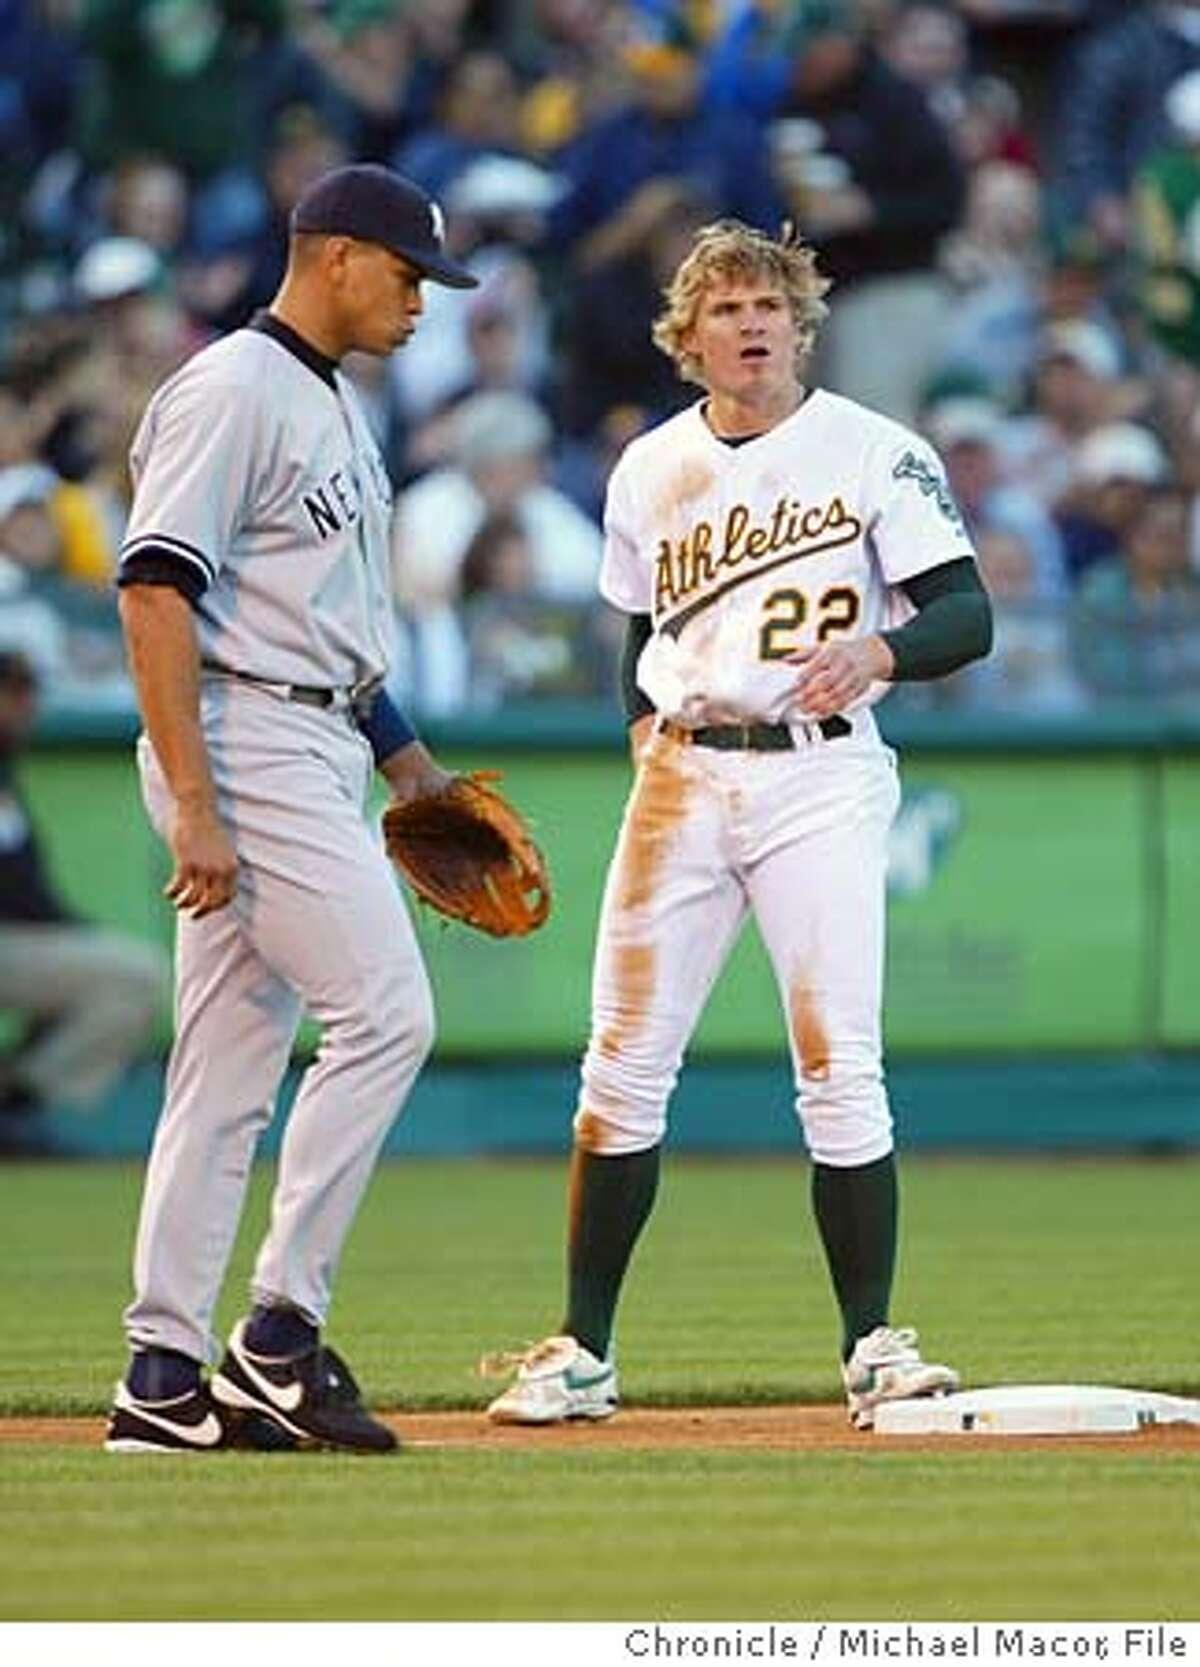 athletics057_mac.jpgOAkland's 22- Eric Byrnes steals 3rd base, Yankee's 3rd baseman 13- alex Rodriguez close by. Major League Baseball Oakland Atletics vs. New York Yankees event on 5/4/04 in Oakland Michael Macor / San Francisco Chronicle